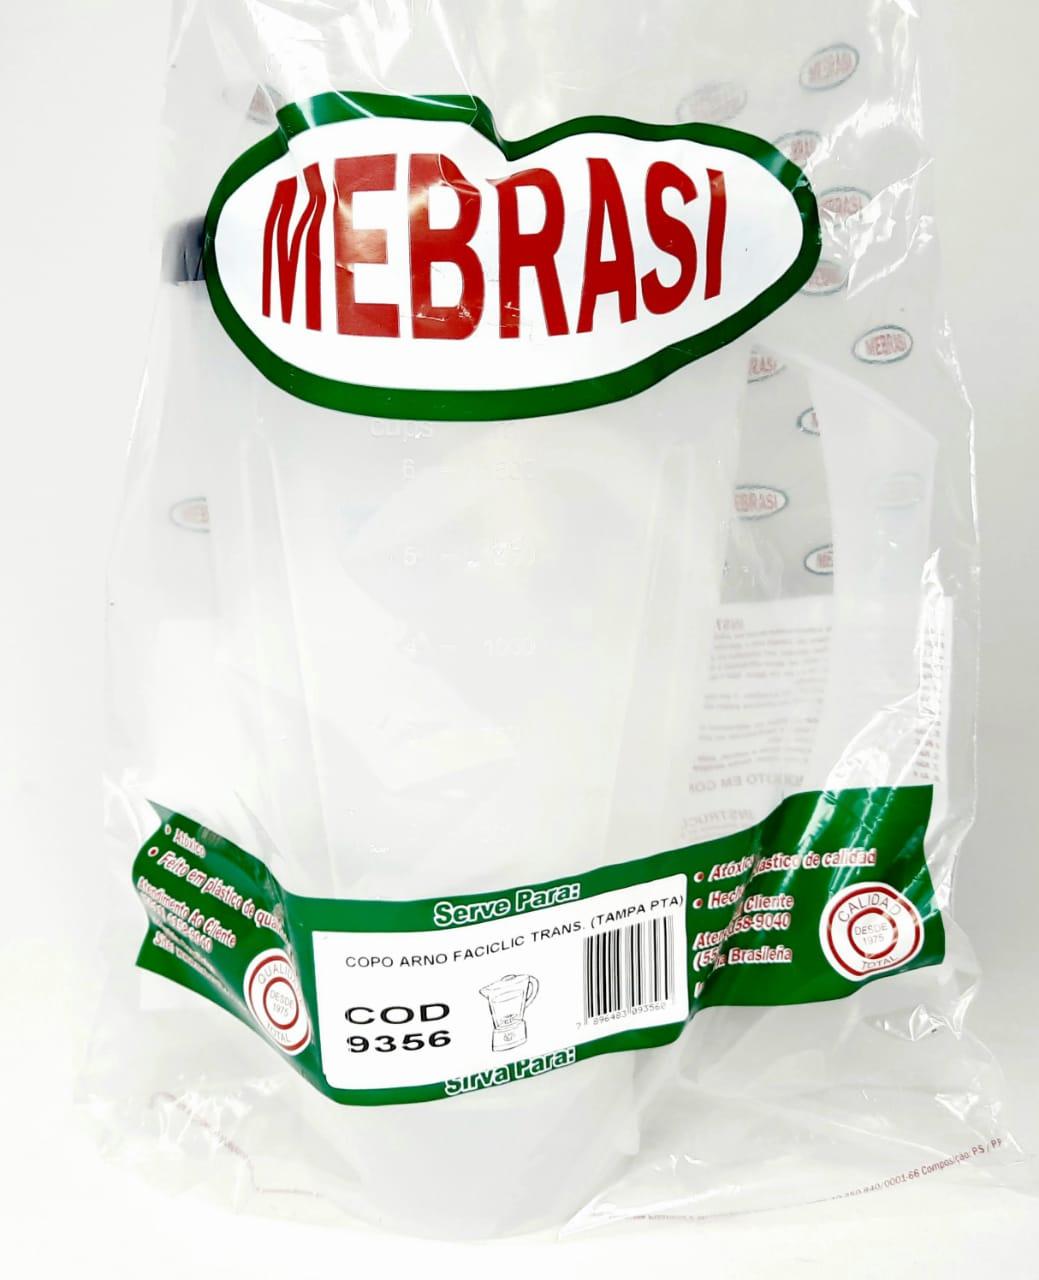 Copo Arno Translúcido Faciclic T/PT - Mebrasi